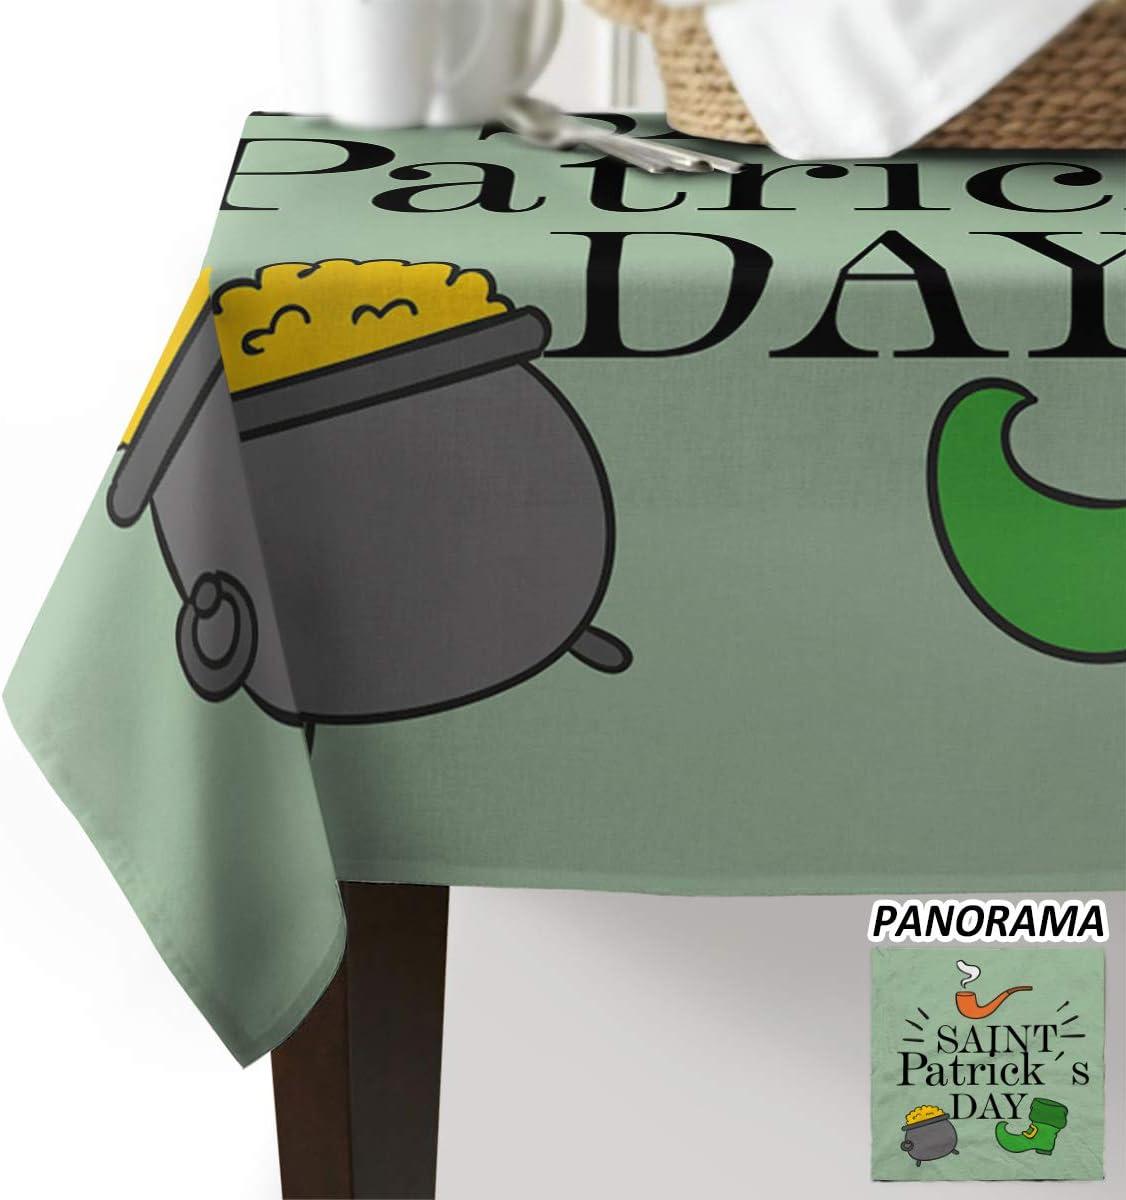 St. Patrick's Day Table Cloth スピード対応 全国送料無料 Rectangular 人気 Polyester Tablecloth 5